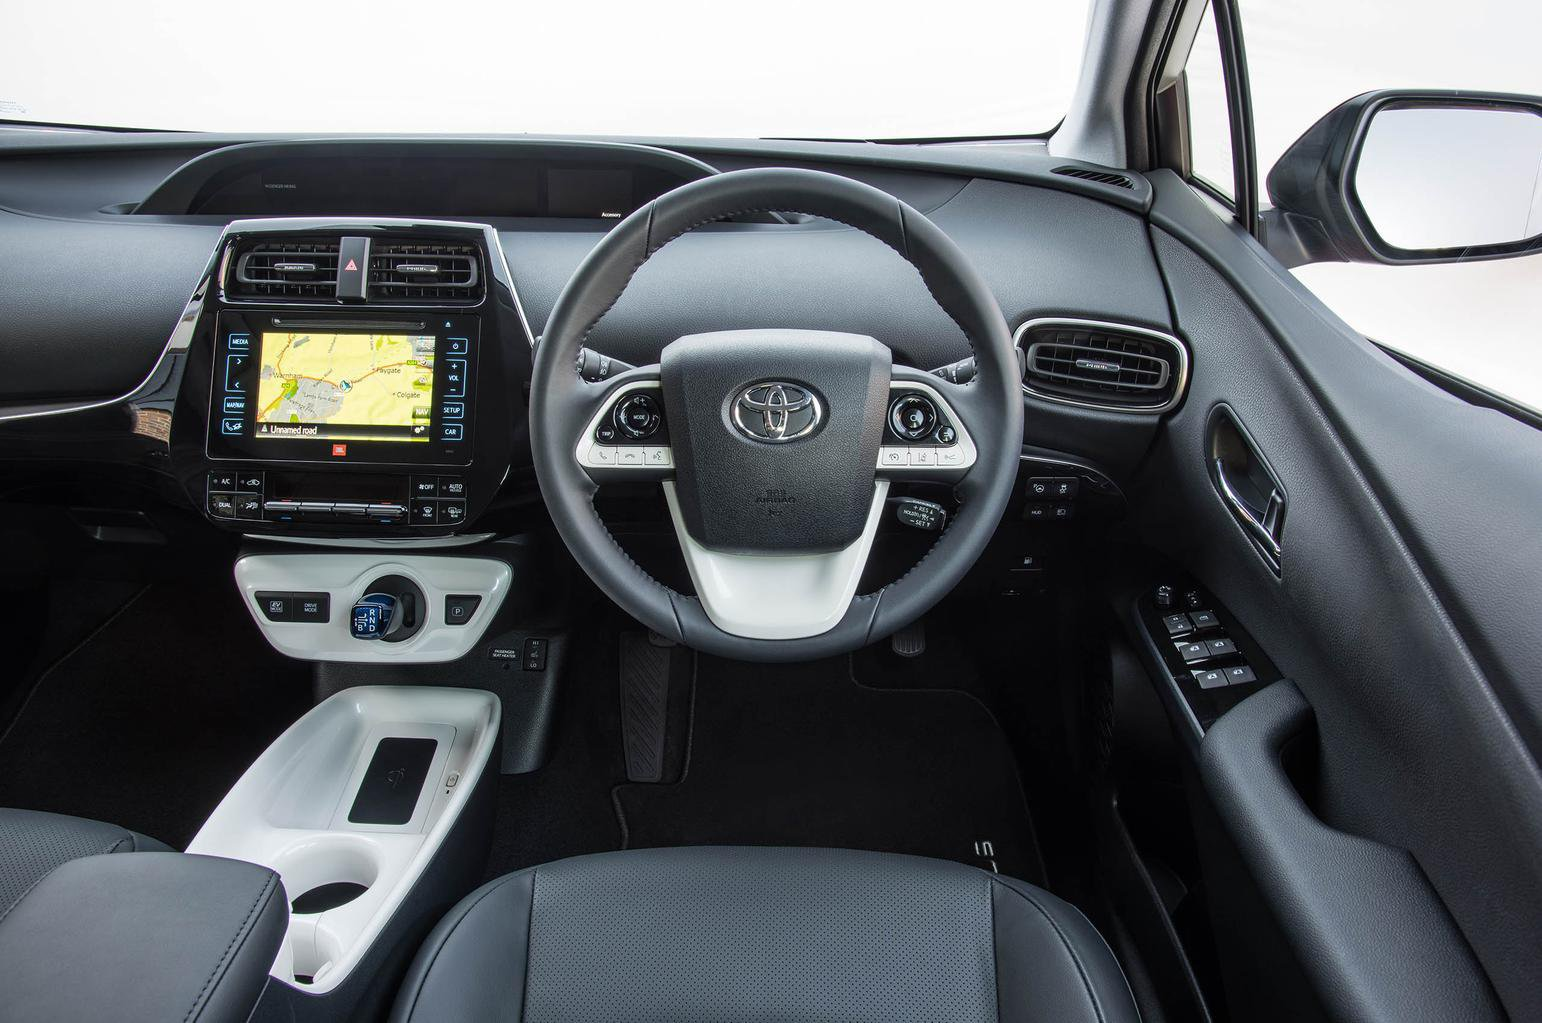 Toyota Prius 1.8 VVT-i Active CVT - interior